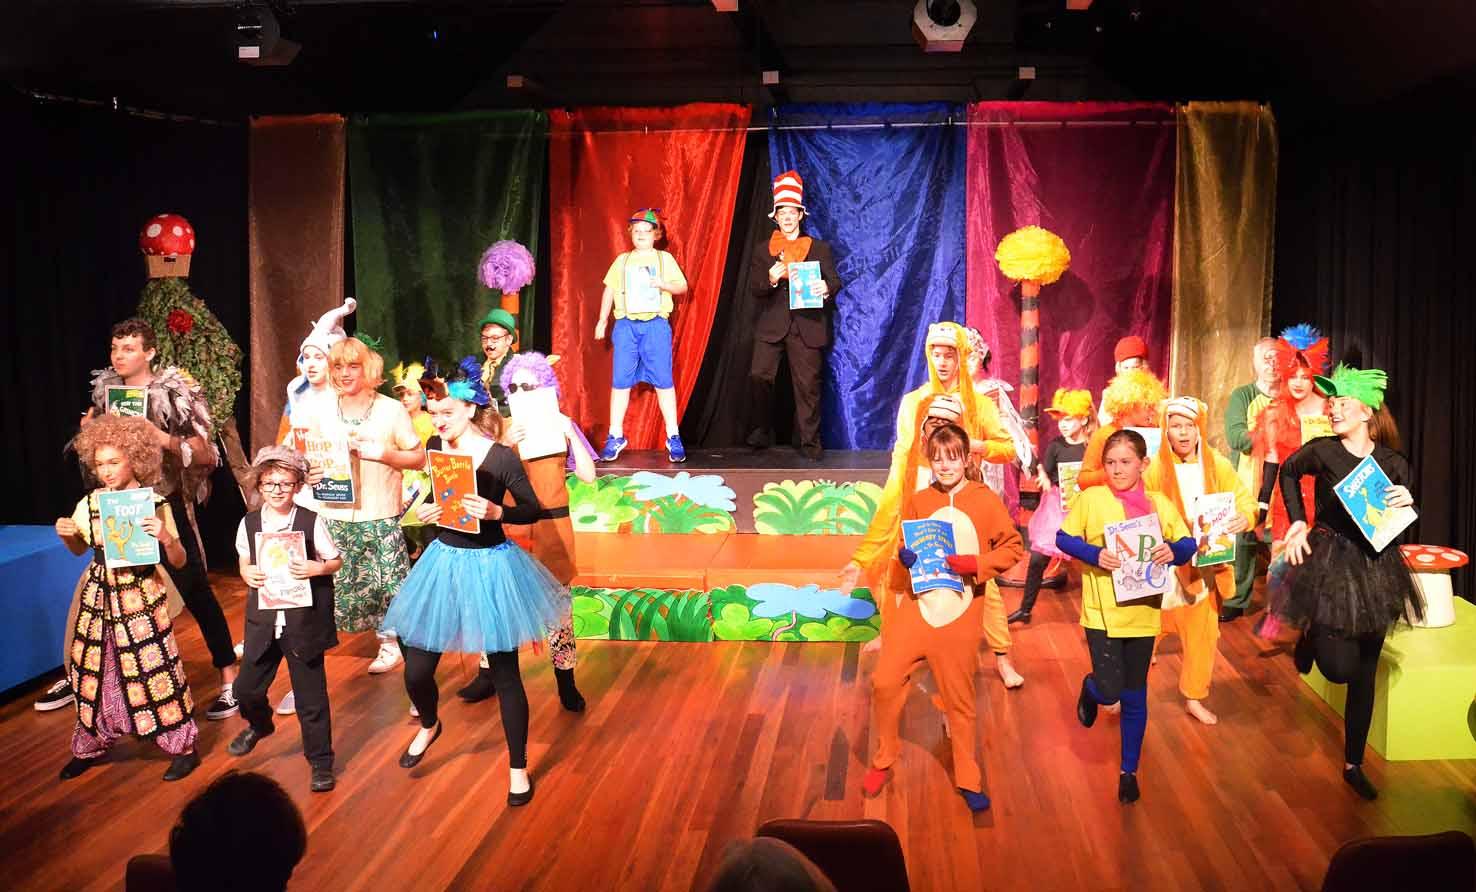 Seuss Jnr by Dawn Pugh - allcast_dance_5745